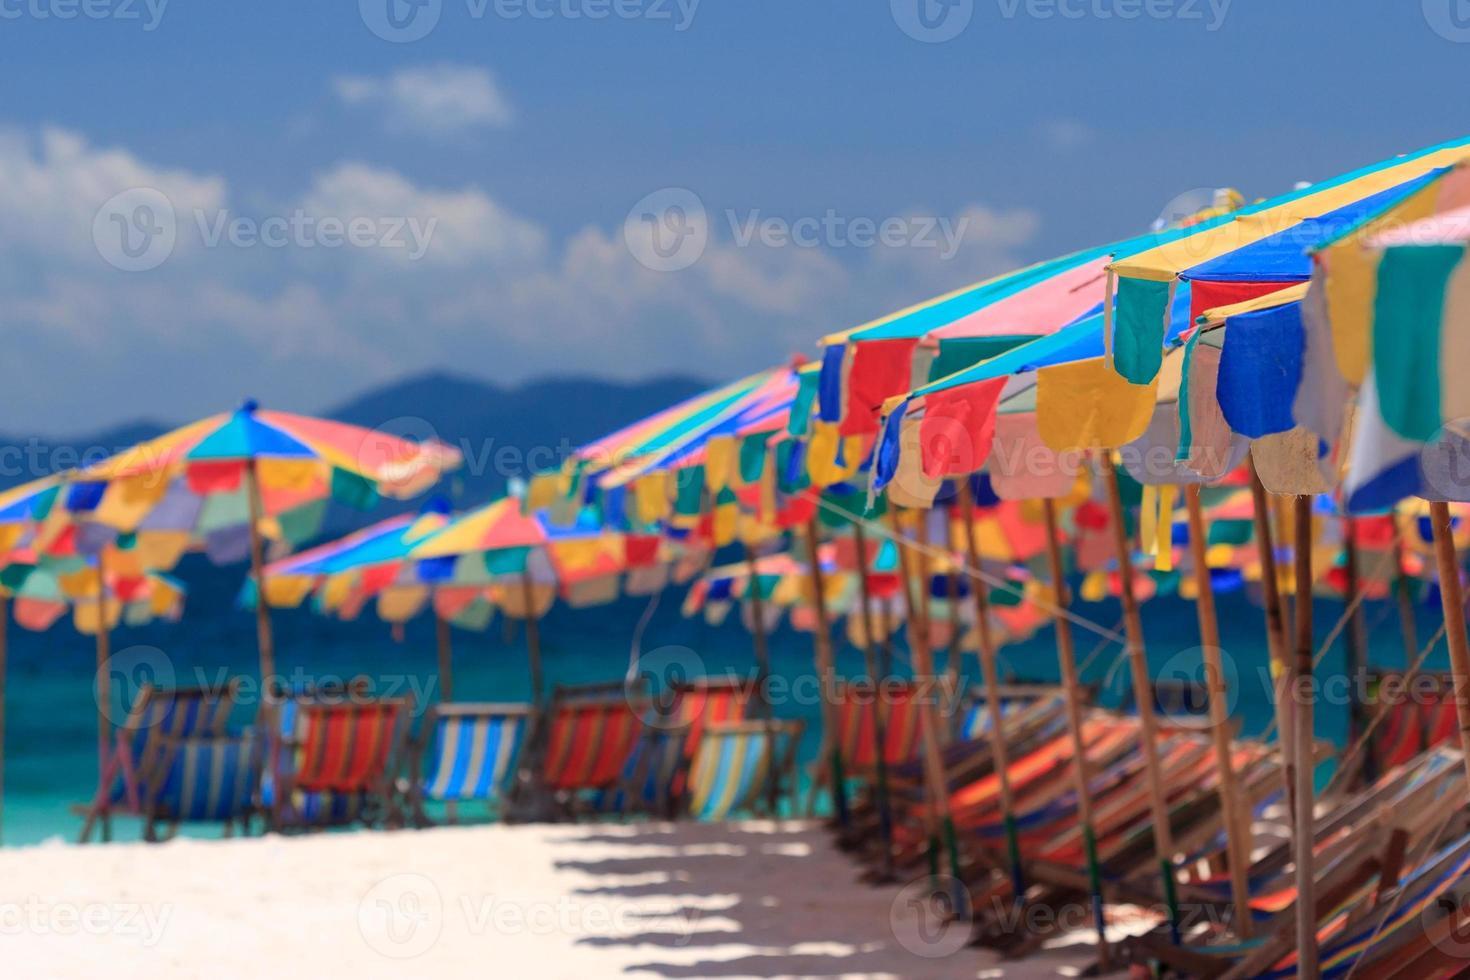 sillas de playa y sombrillas en la isla de koh khai. Phuket, Tailandia. foto